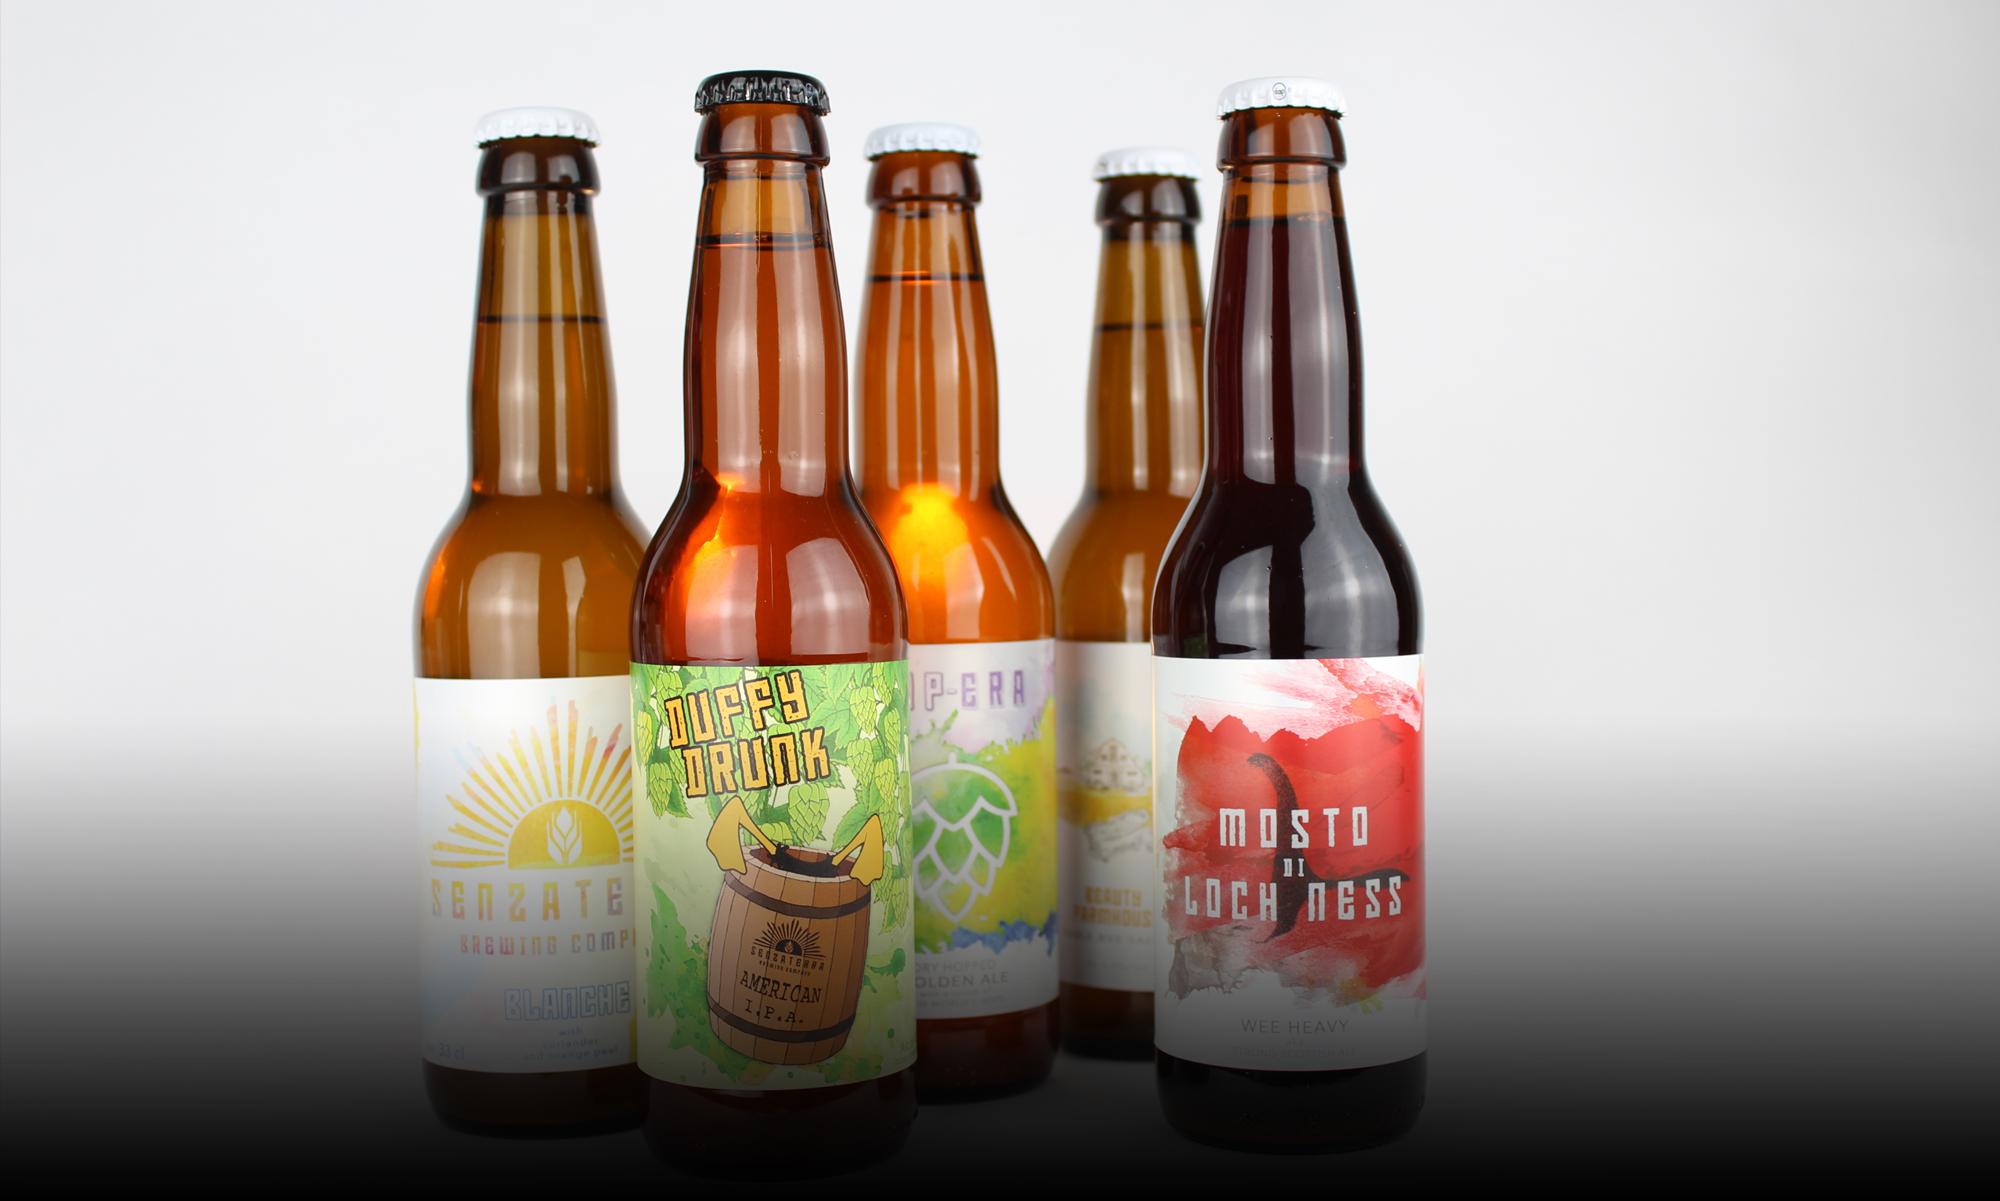 Senzaterra Brewing Company